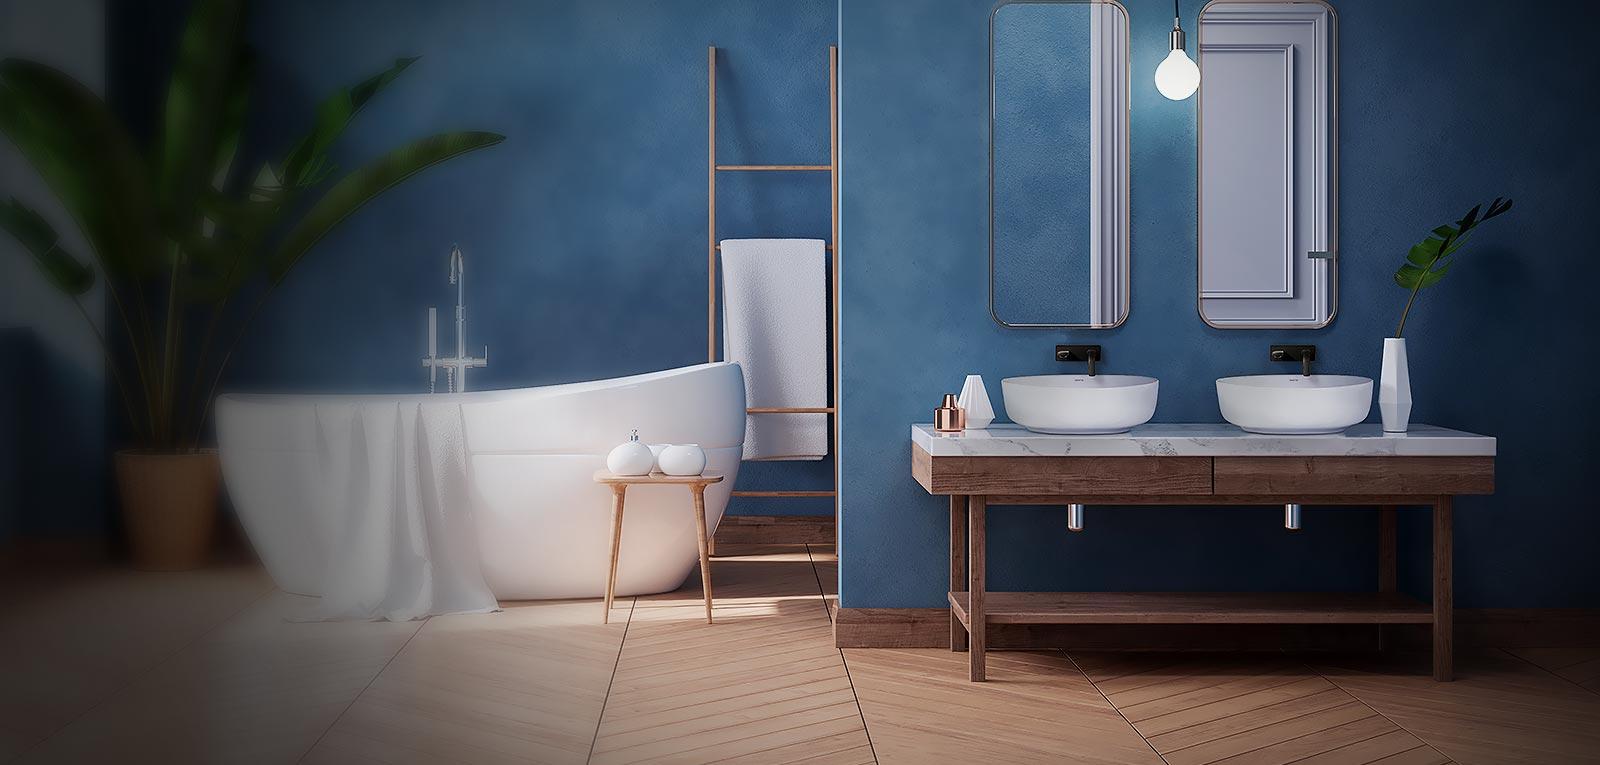 Bathroom Designs, India | Bathroom Design Ideas For Homes In India